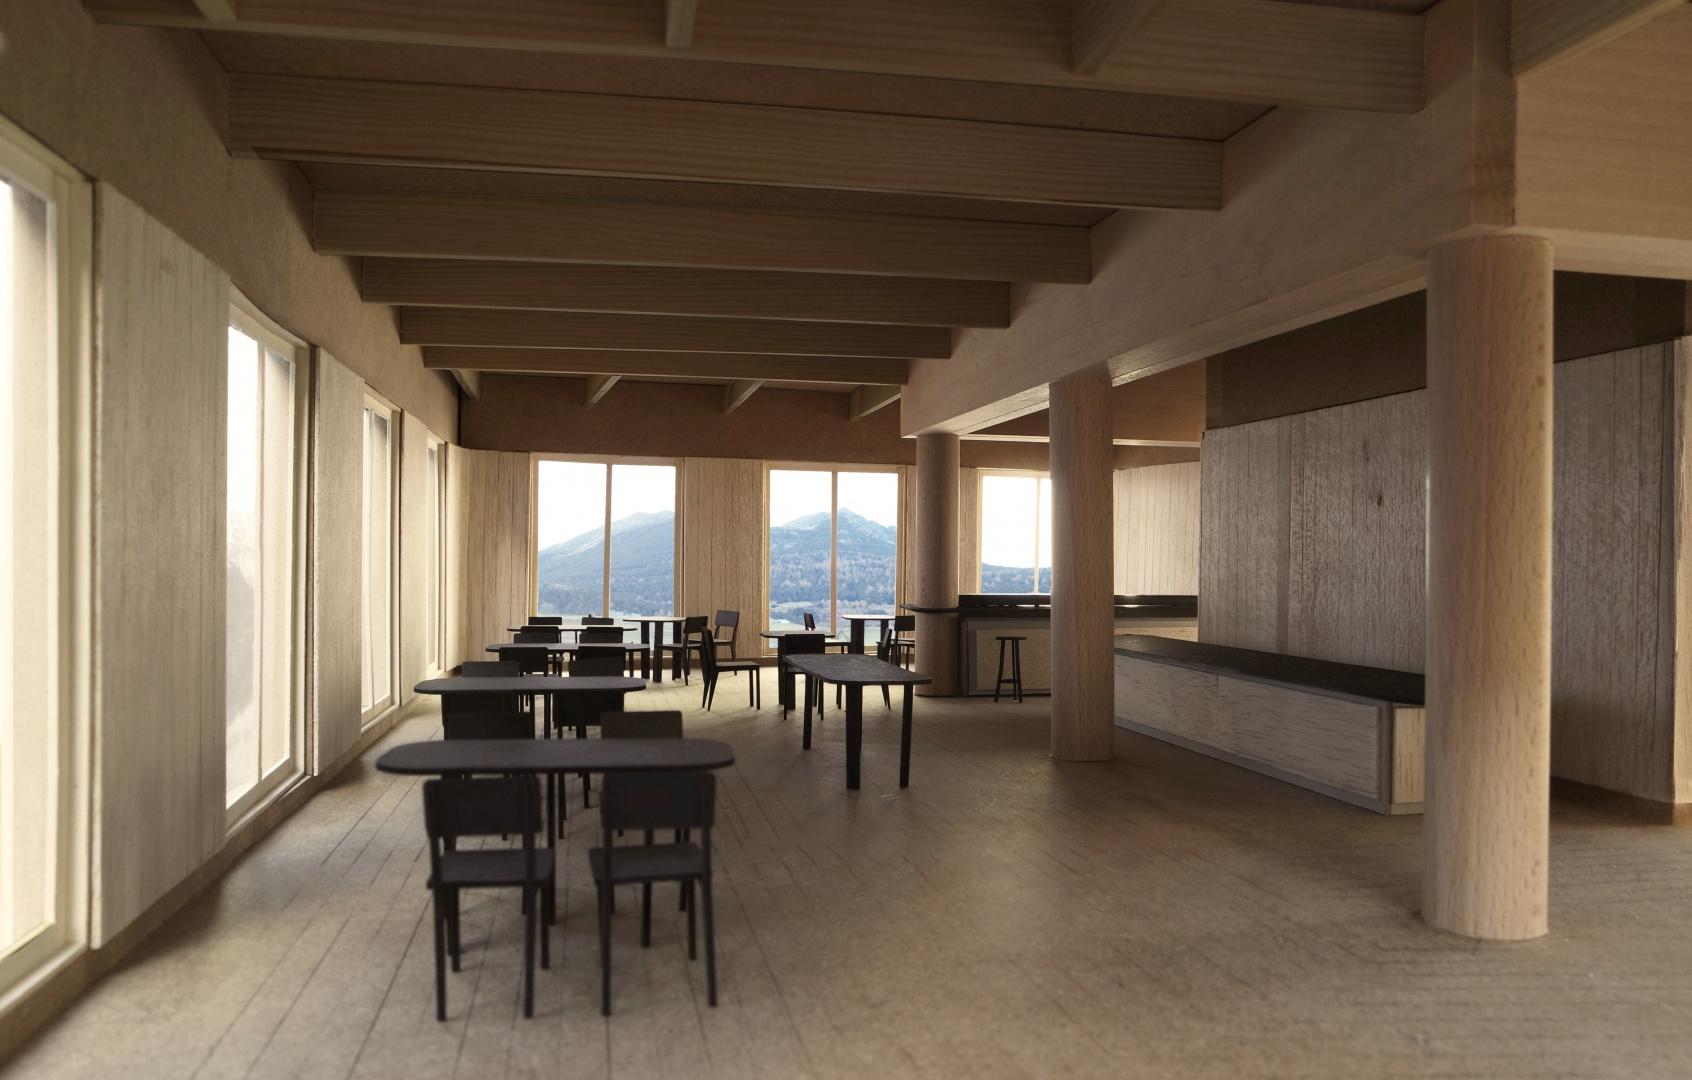 wohnturm riom documentation suisse du batiment. Black Bedroom Furniture Sets. Home Design Ideas